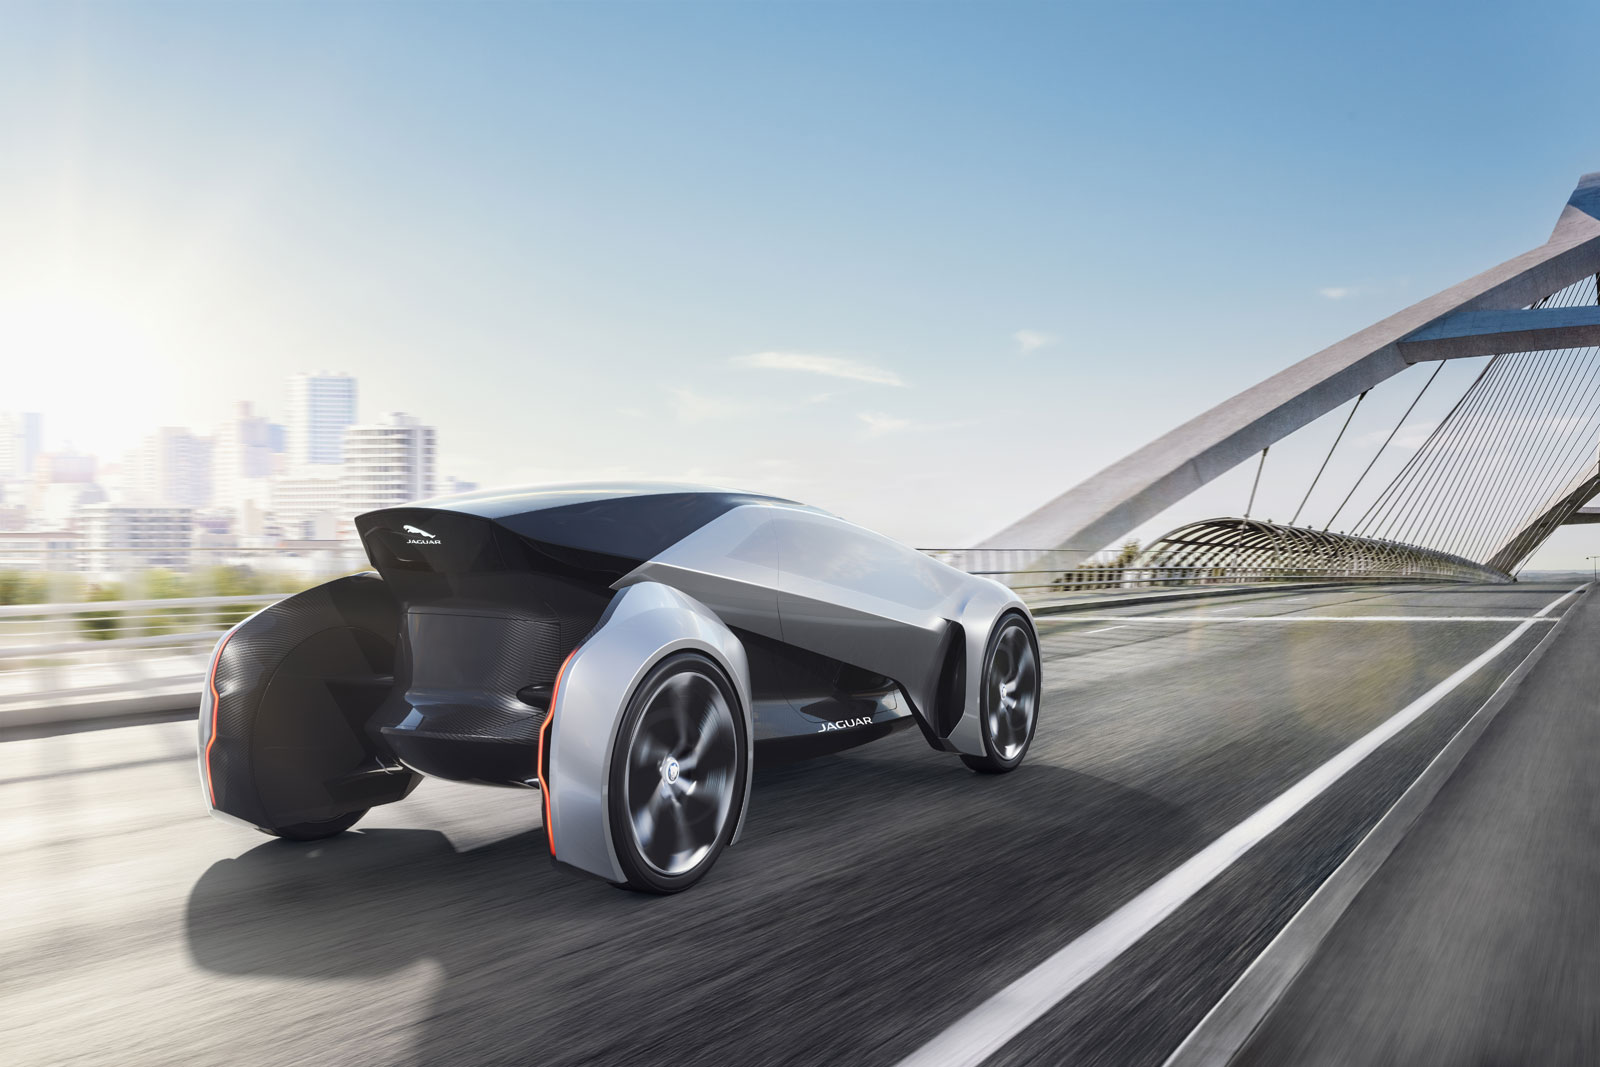 Jaguar Future Type Concept - Car Body Design